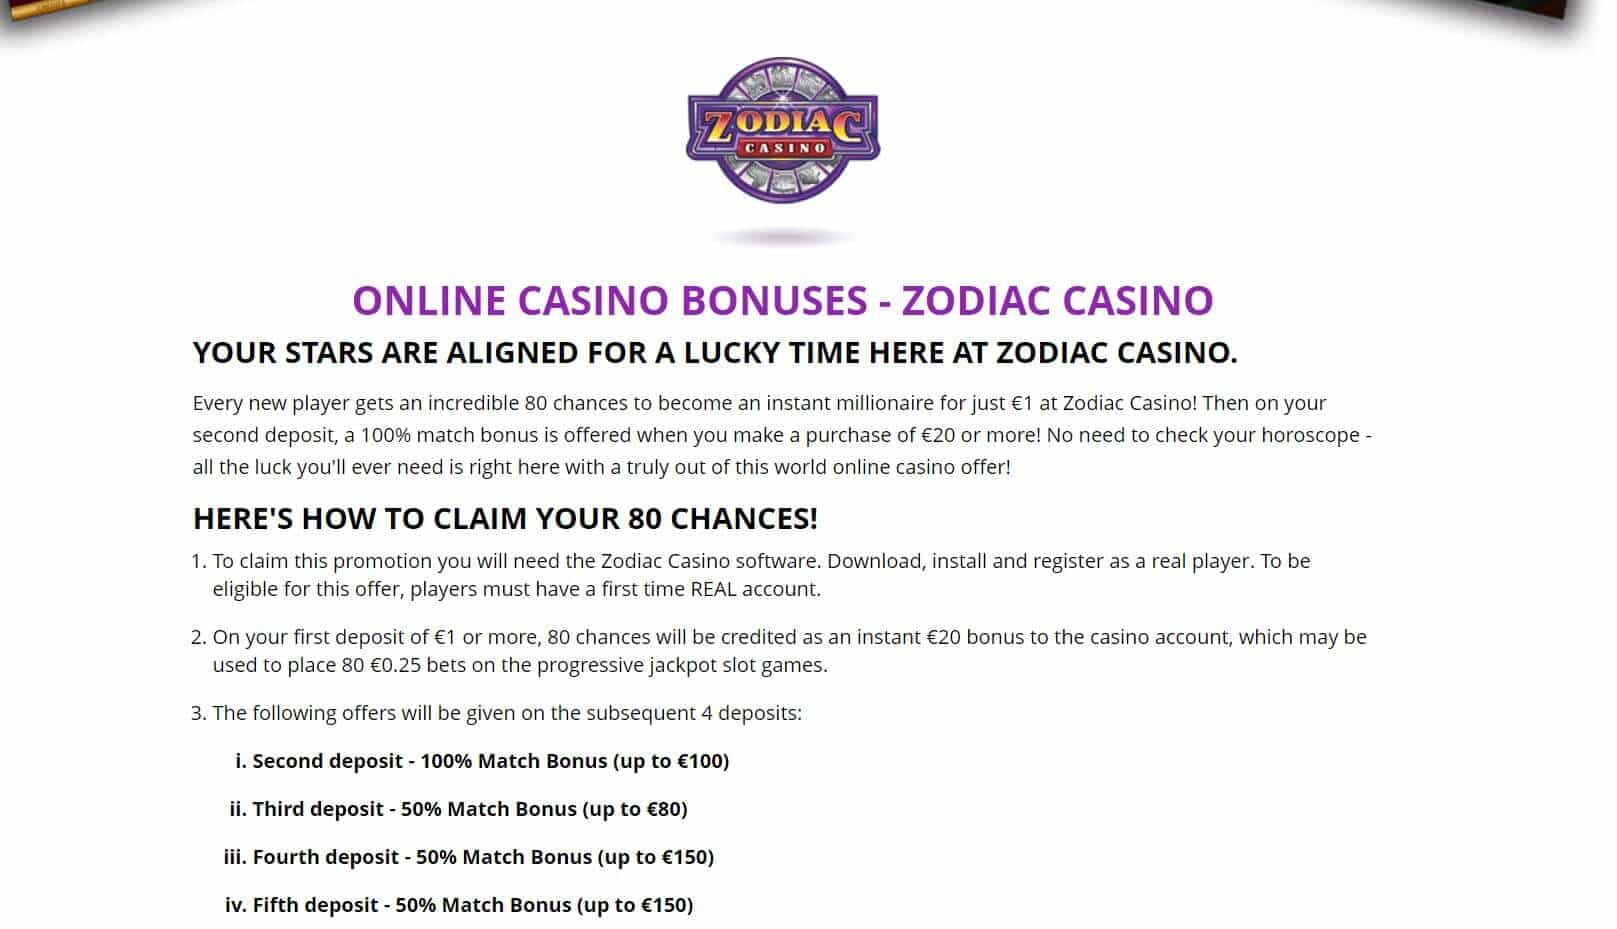 Zodiac casino bonus system